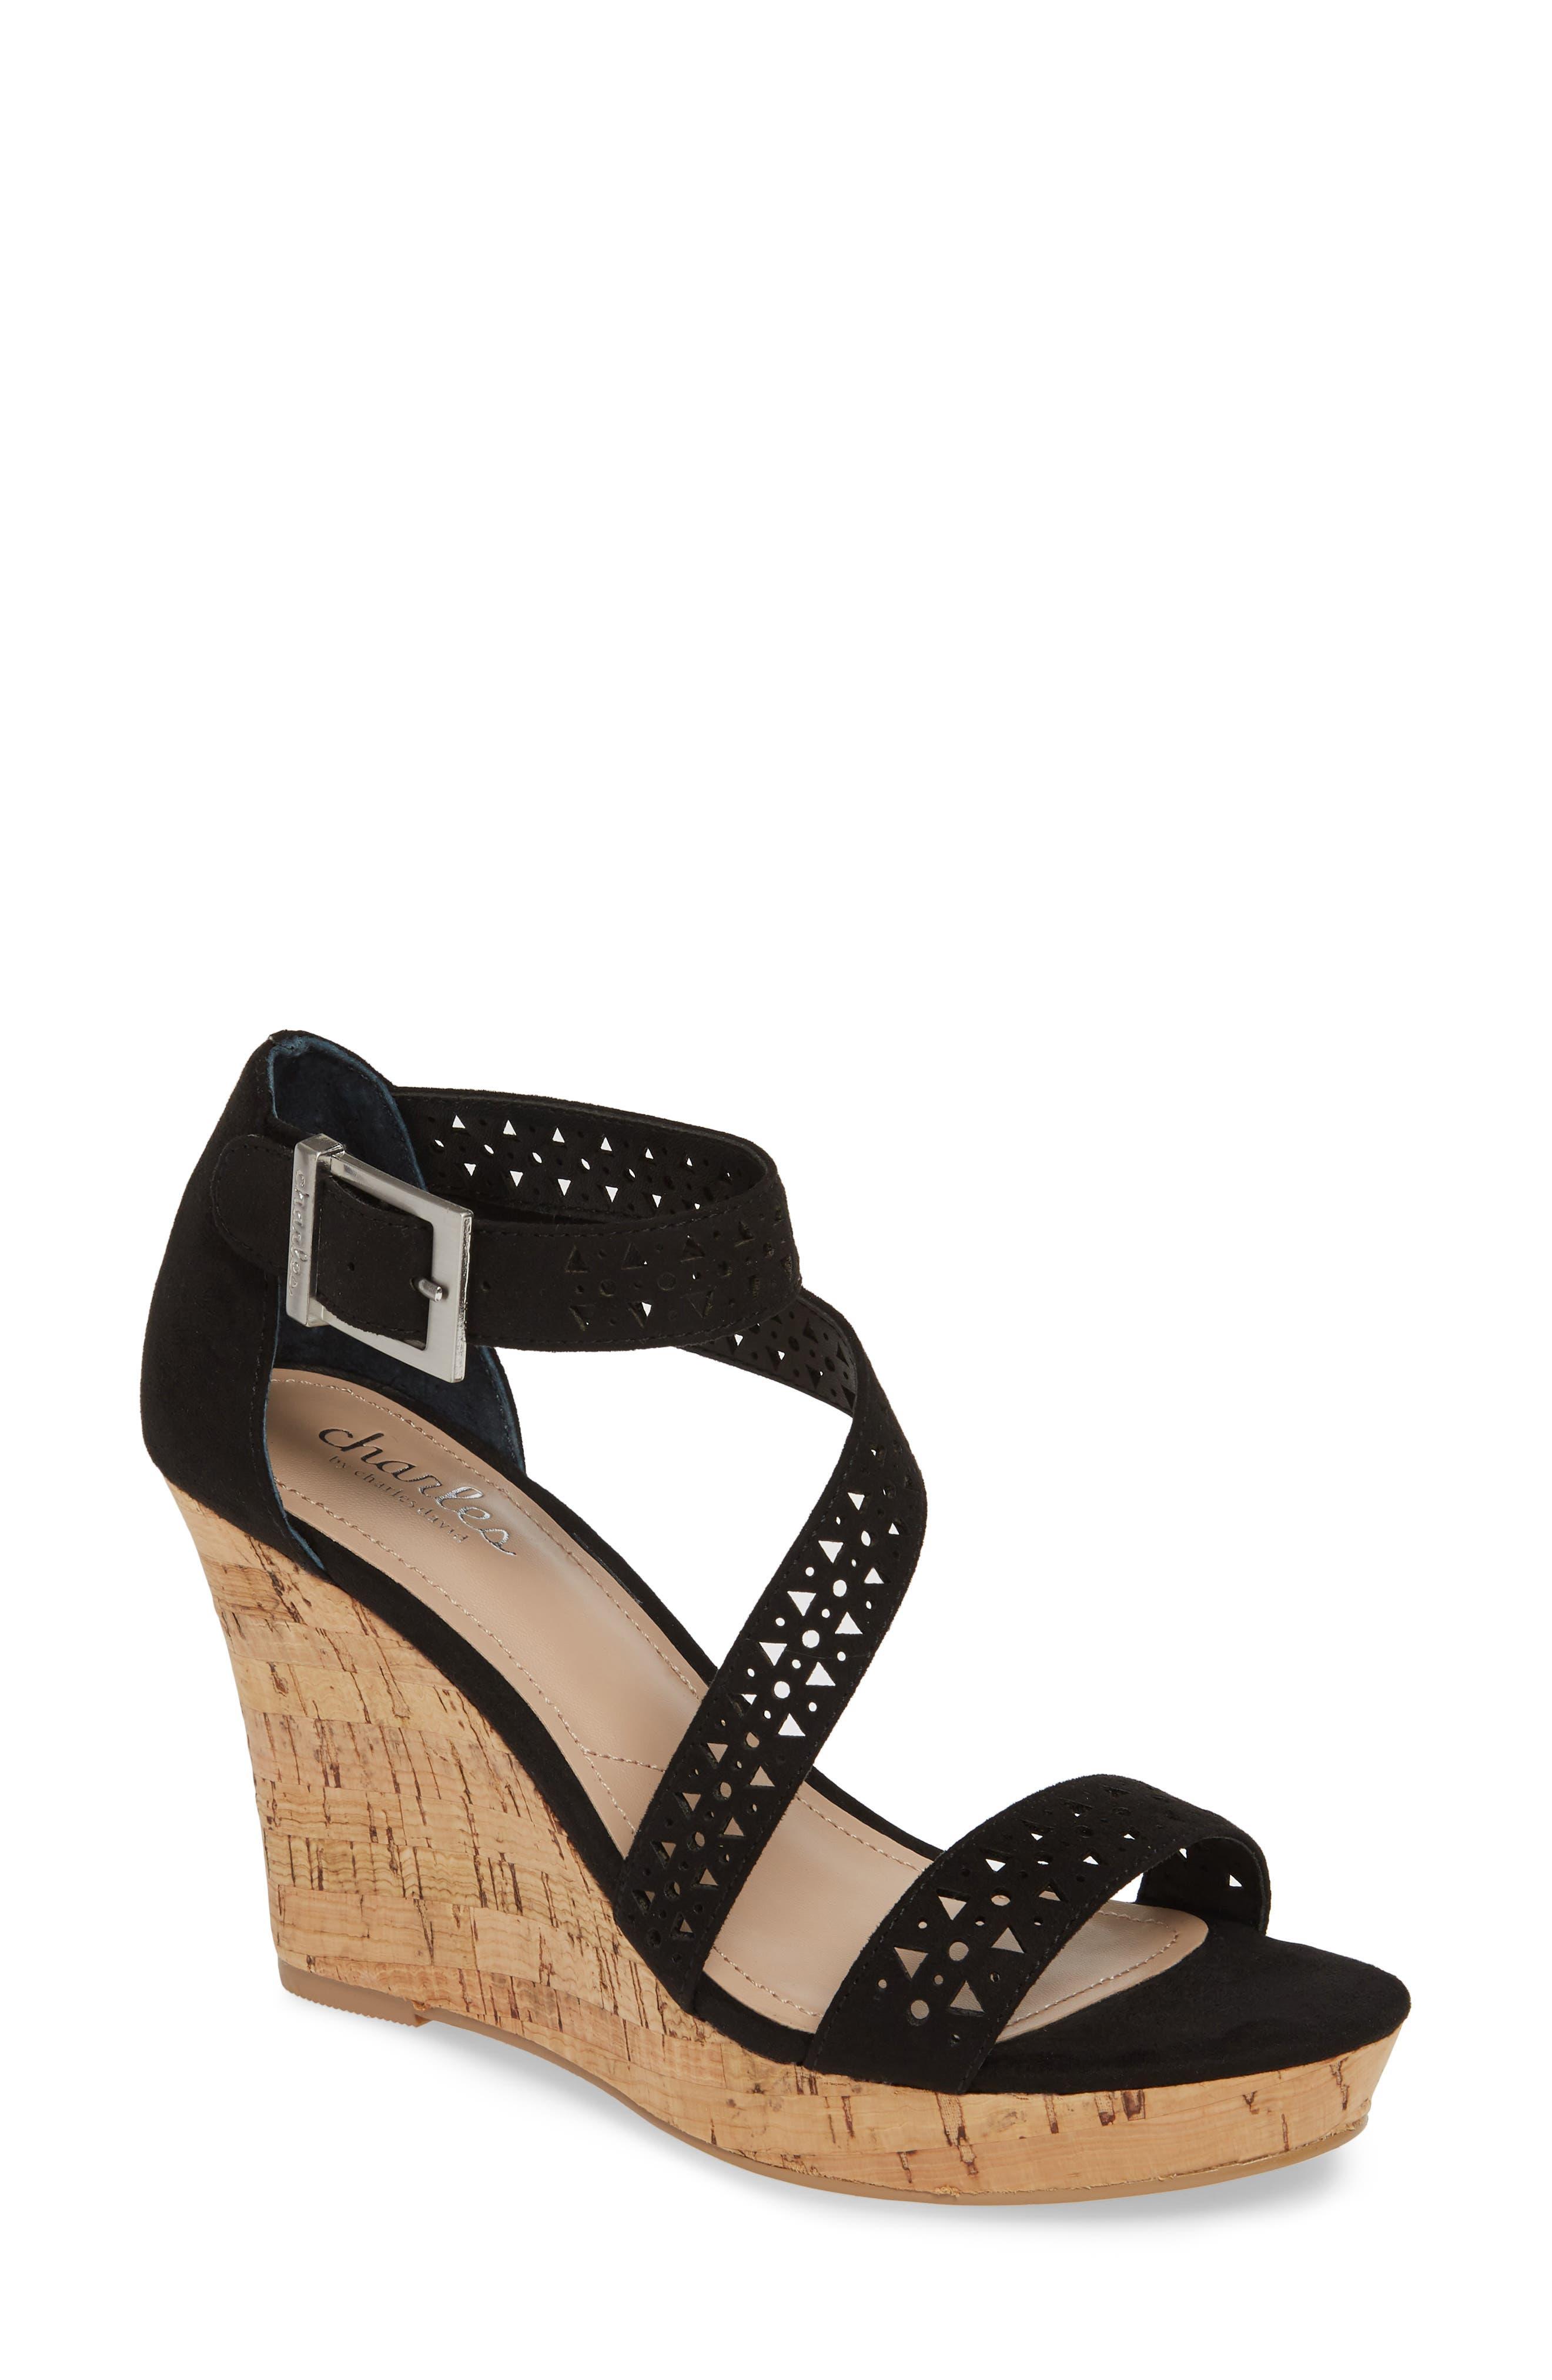 Landon Perforated Wedge Sandal, Main, color, BLACK FABRIC